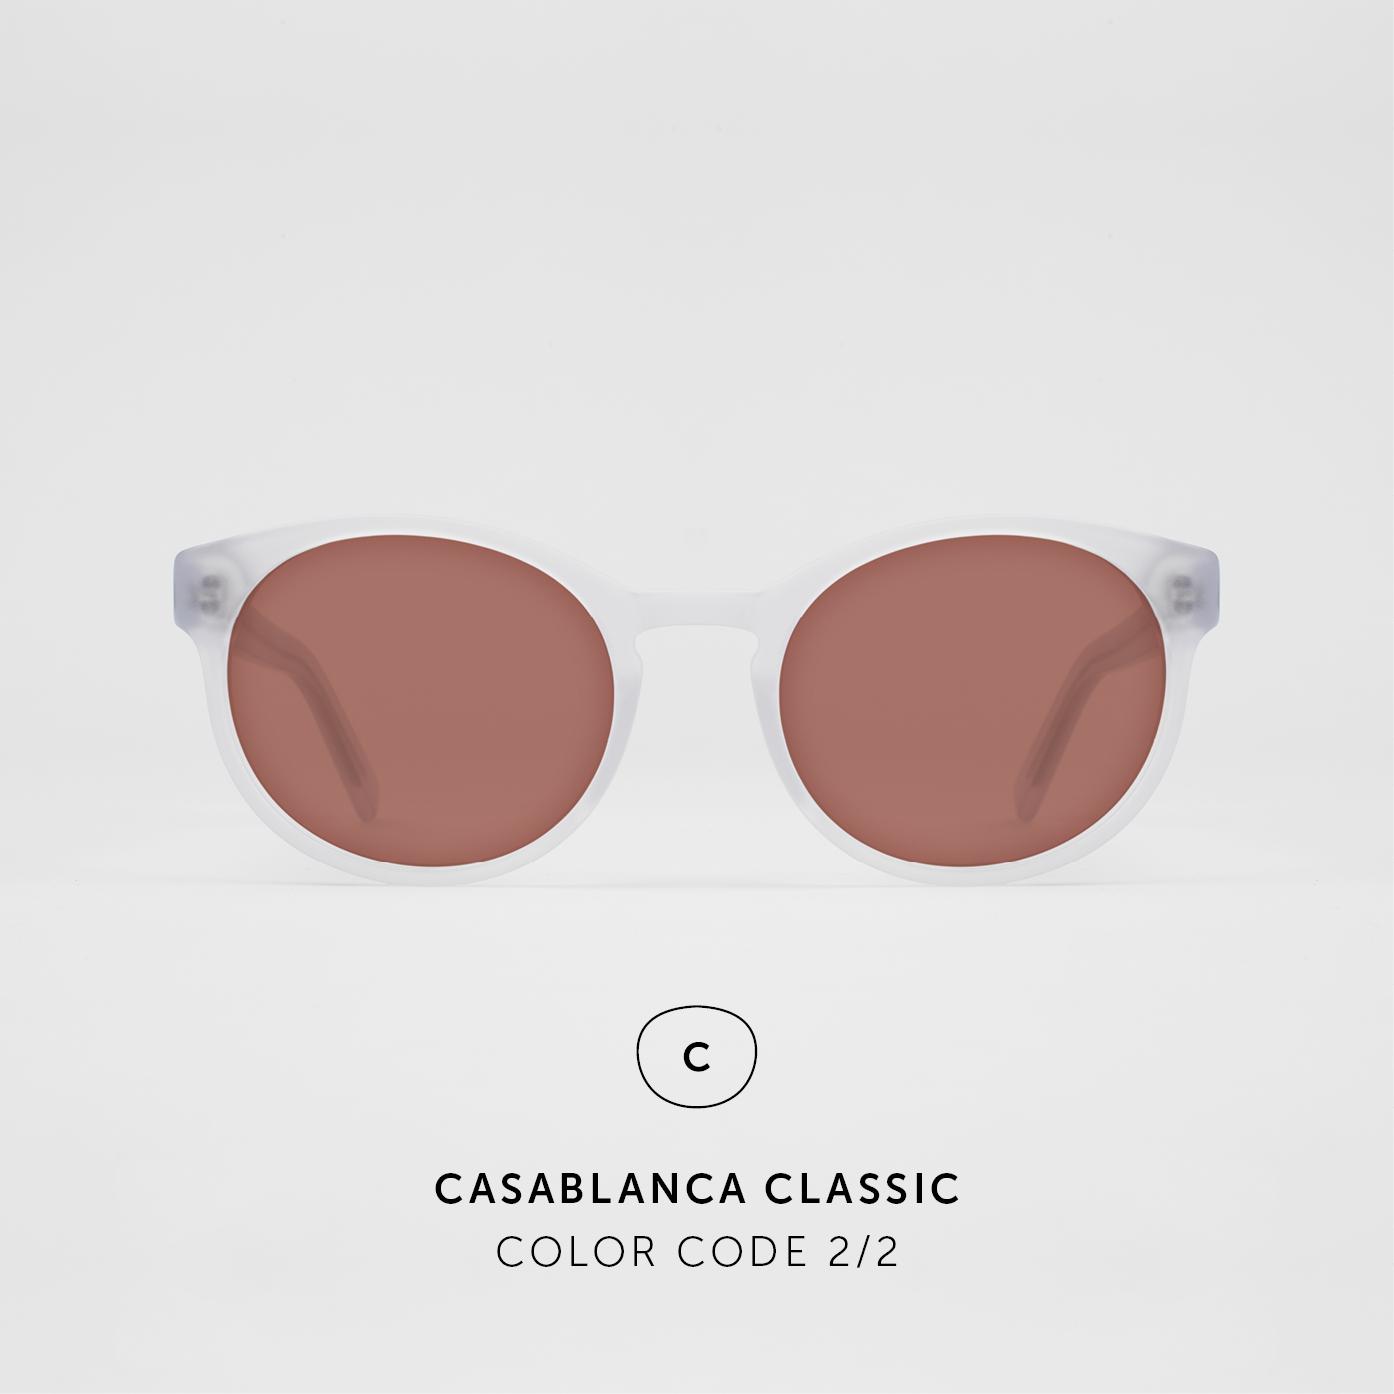 CasablancaClassic19.jpg